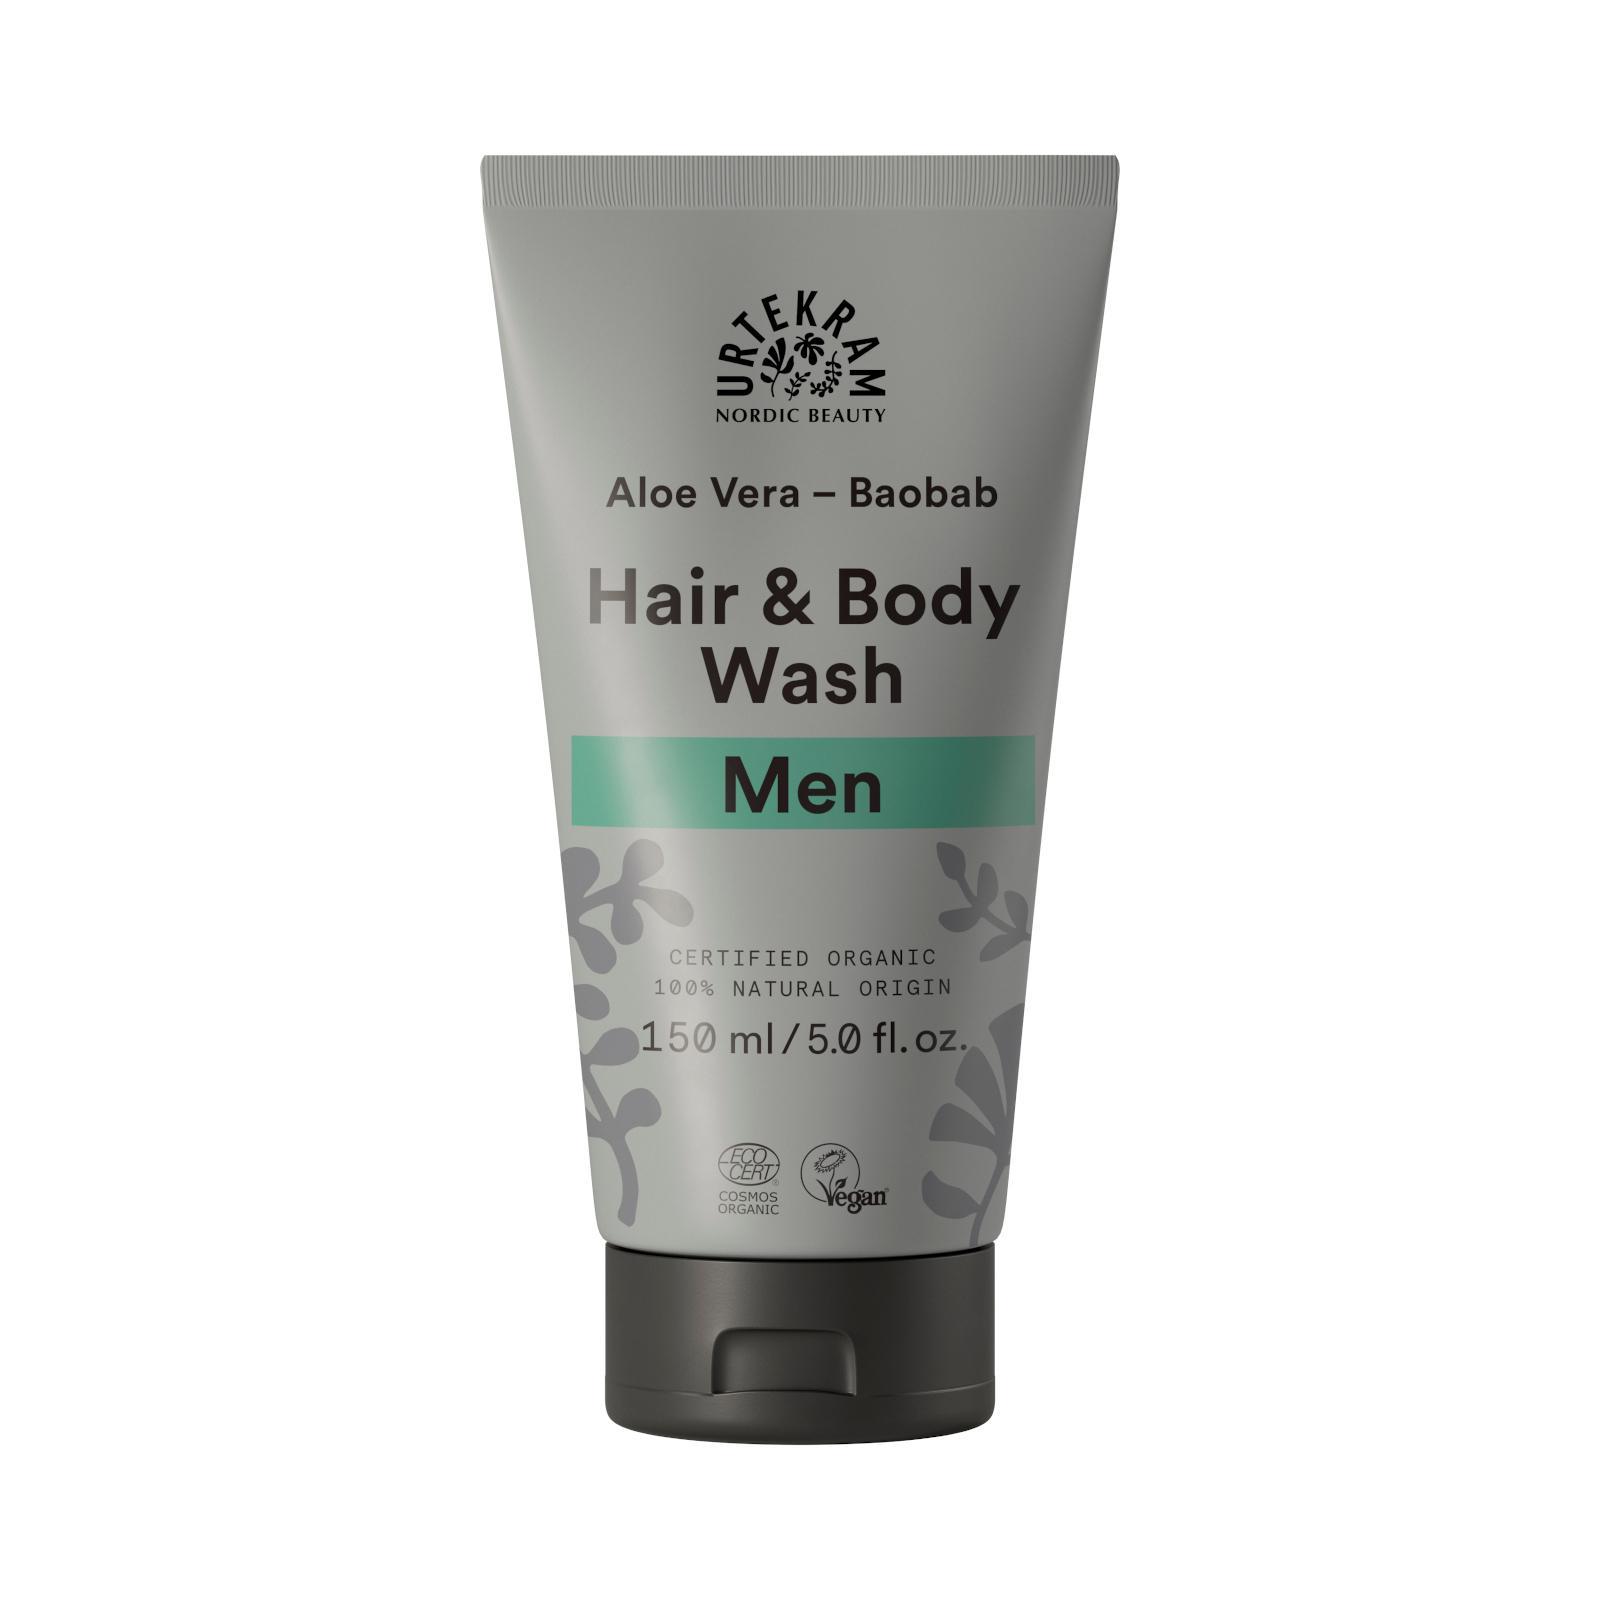 Urtekram Sprchový gel a šampon, MEN 150 ml